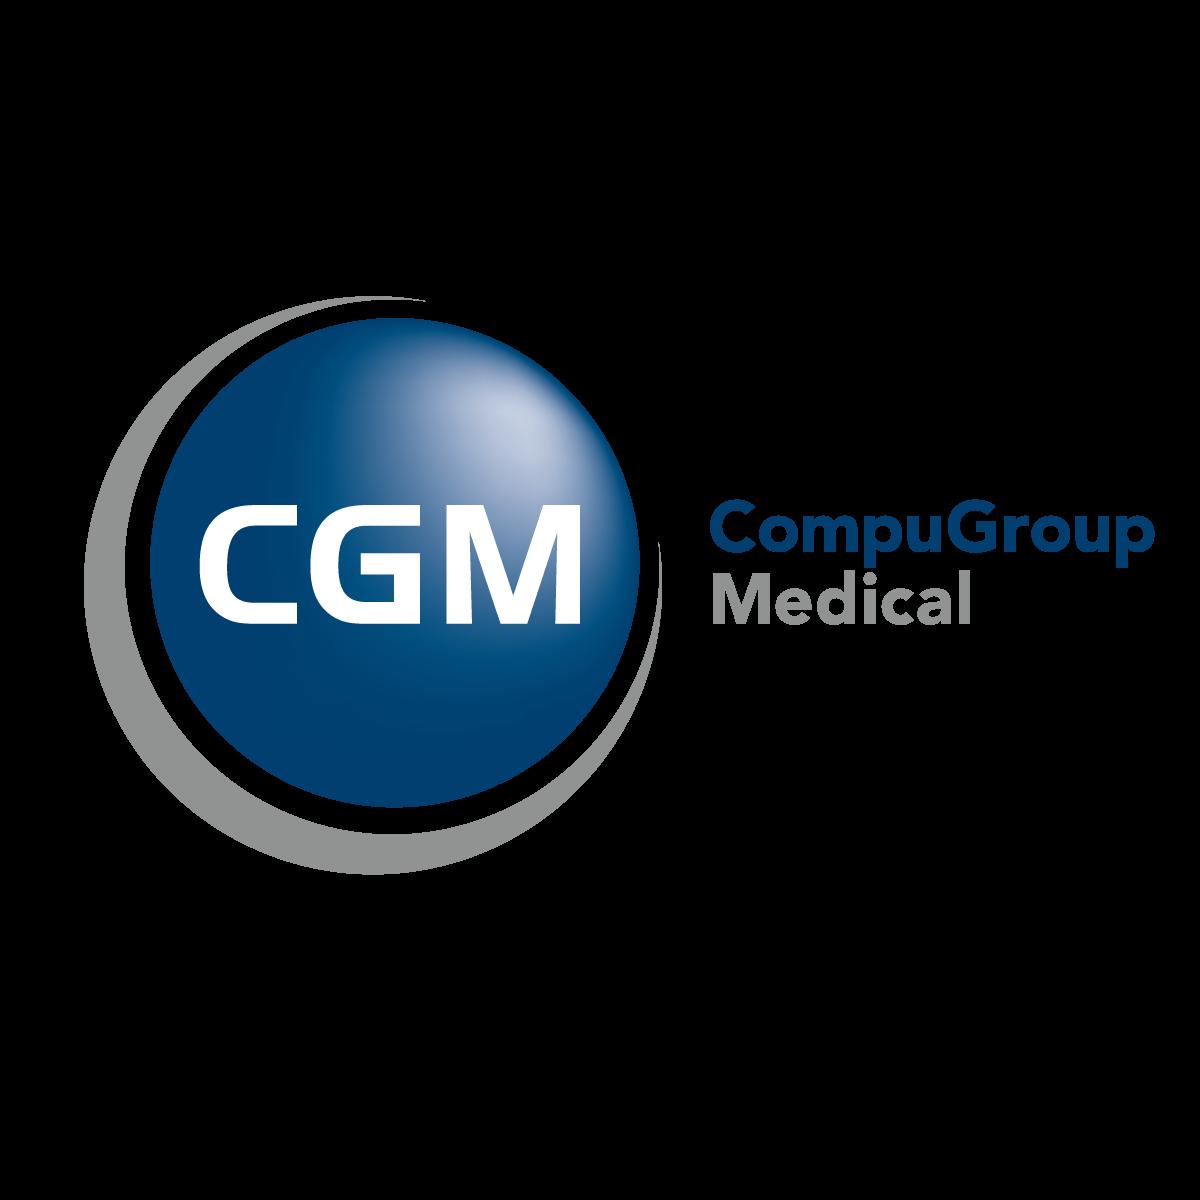 Logo exposant COMPUGROUP MEDICAL